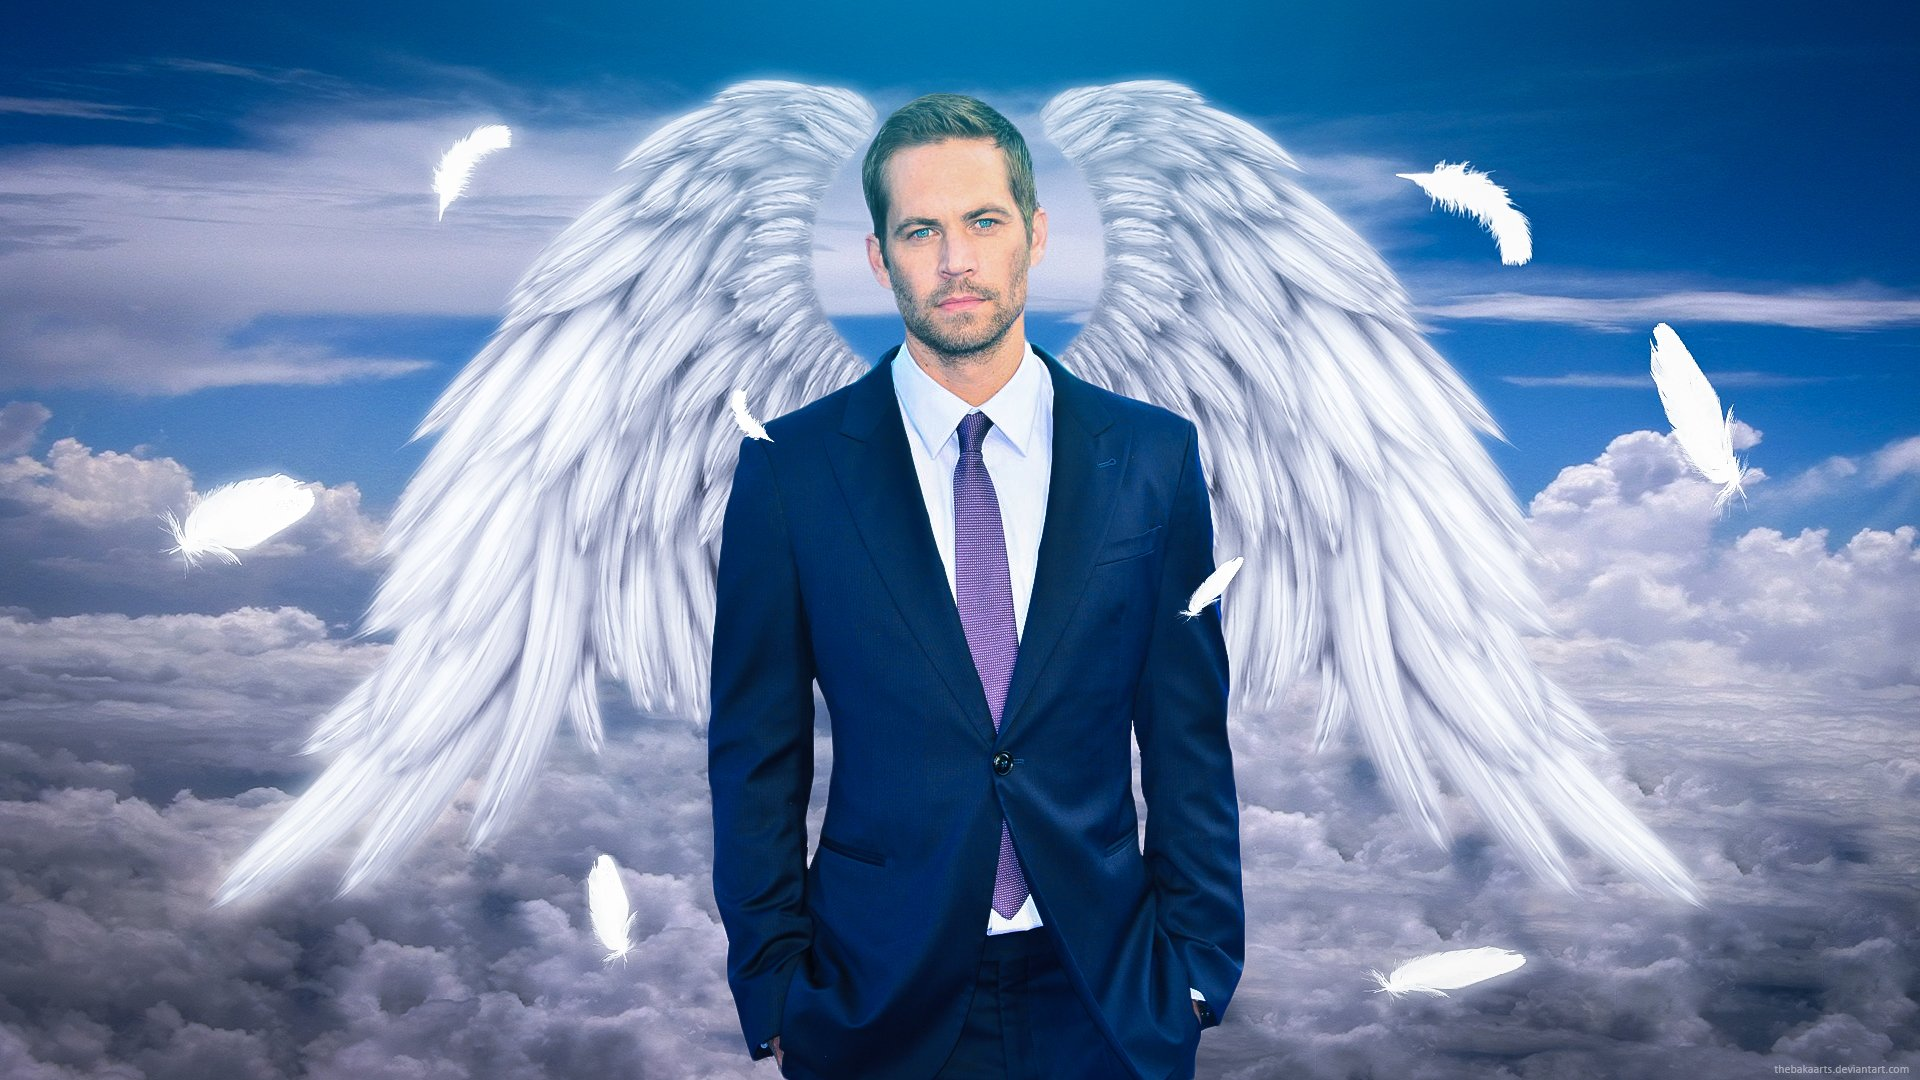 Картинки ангела с крыльями мужчины, логотипом орифлэйм